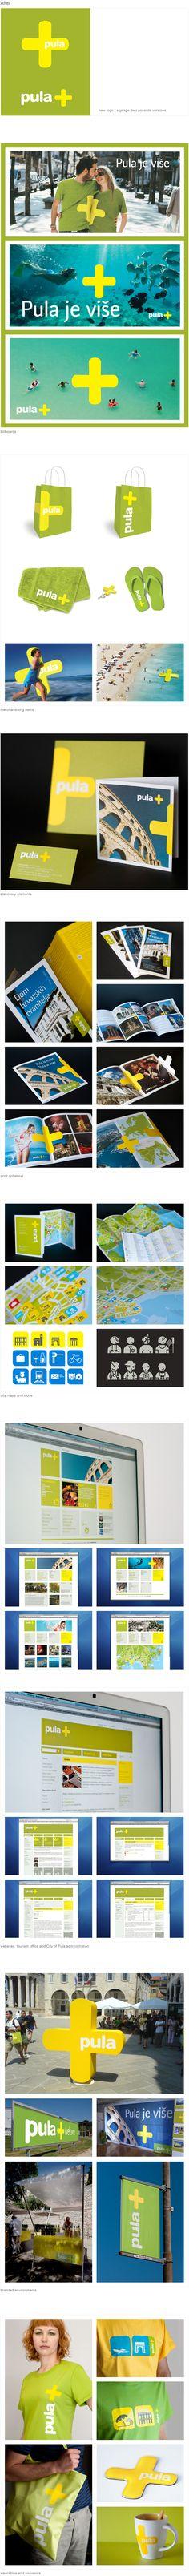 Branding for Pula, Croatia, by Parabureau 2010 #packaging #branding #marketing PD